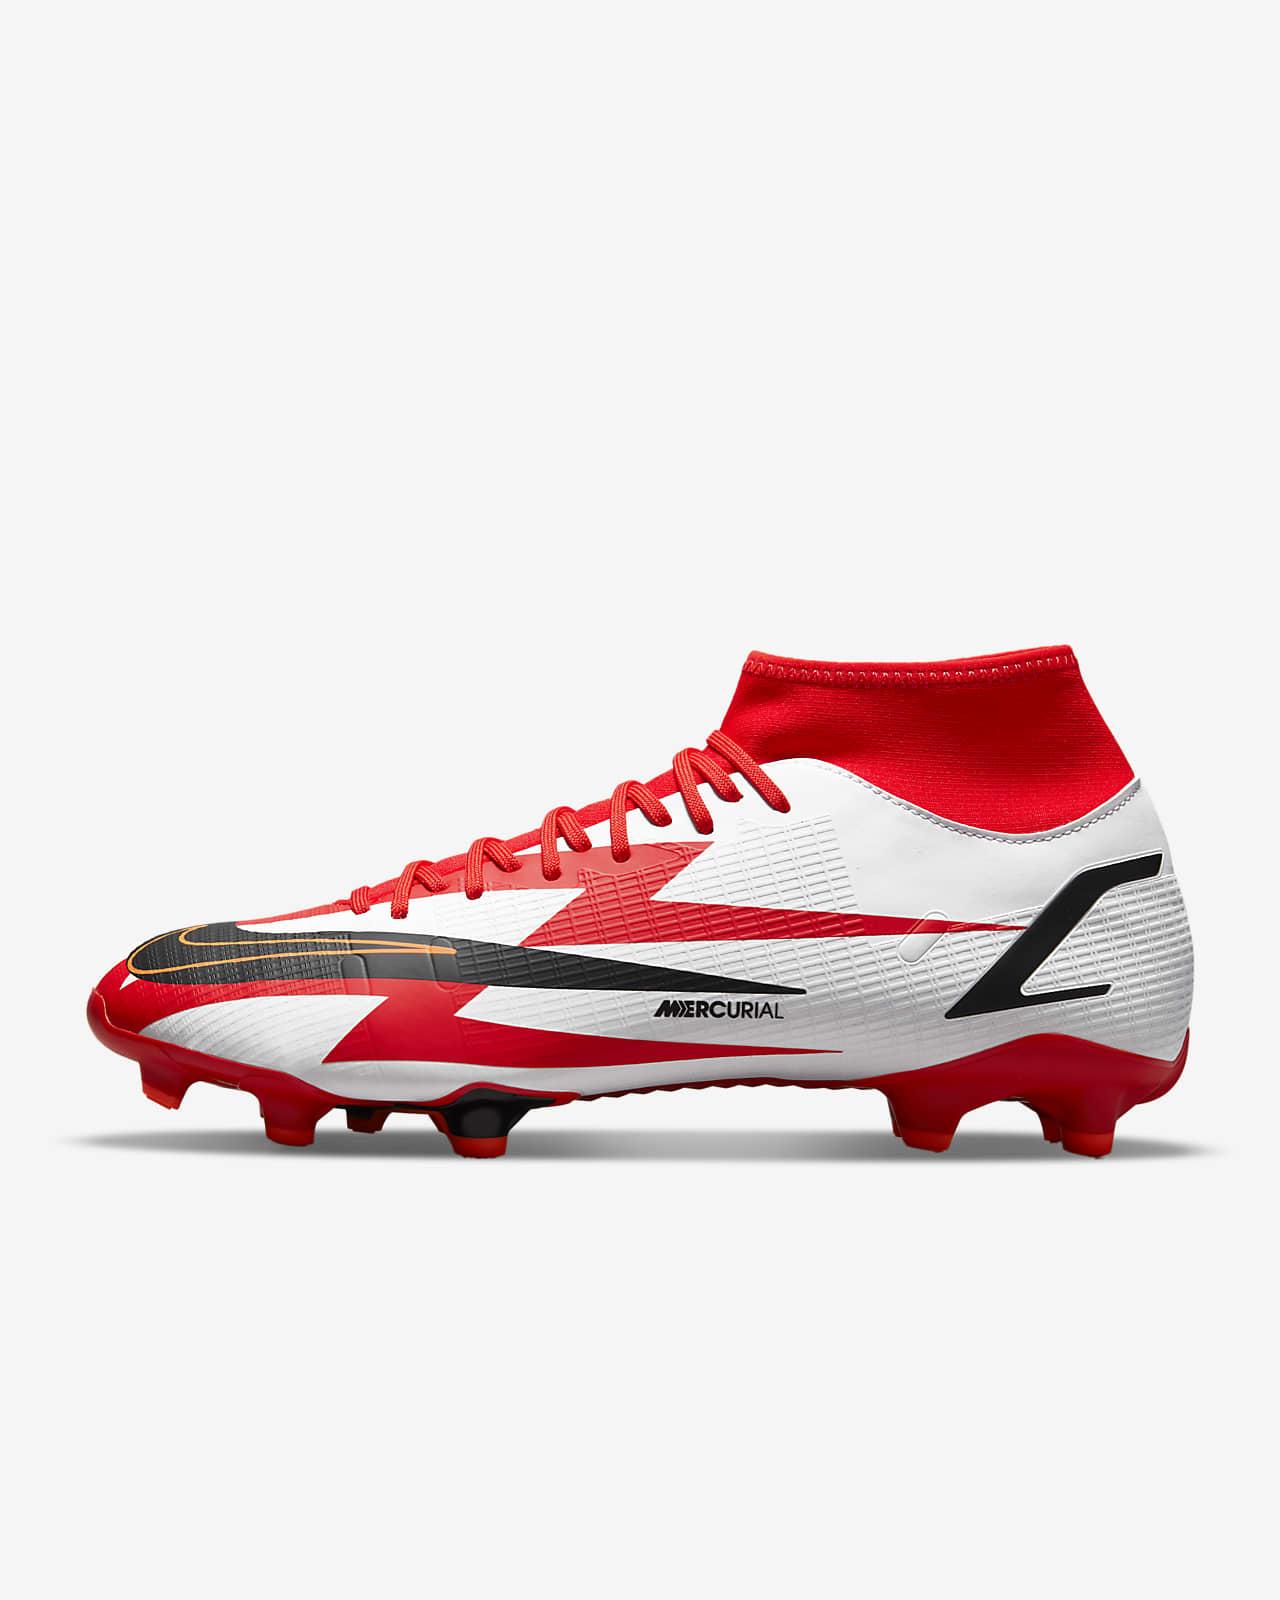 Calzado de fútbol para superficies múltiples Nike Mercurial Superfly 8 Academy CR7 MG